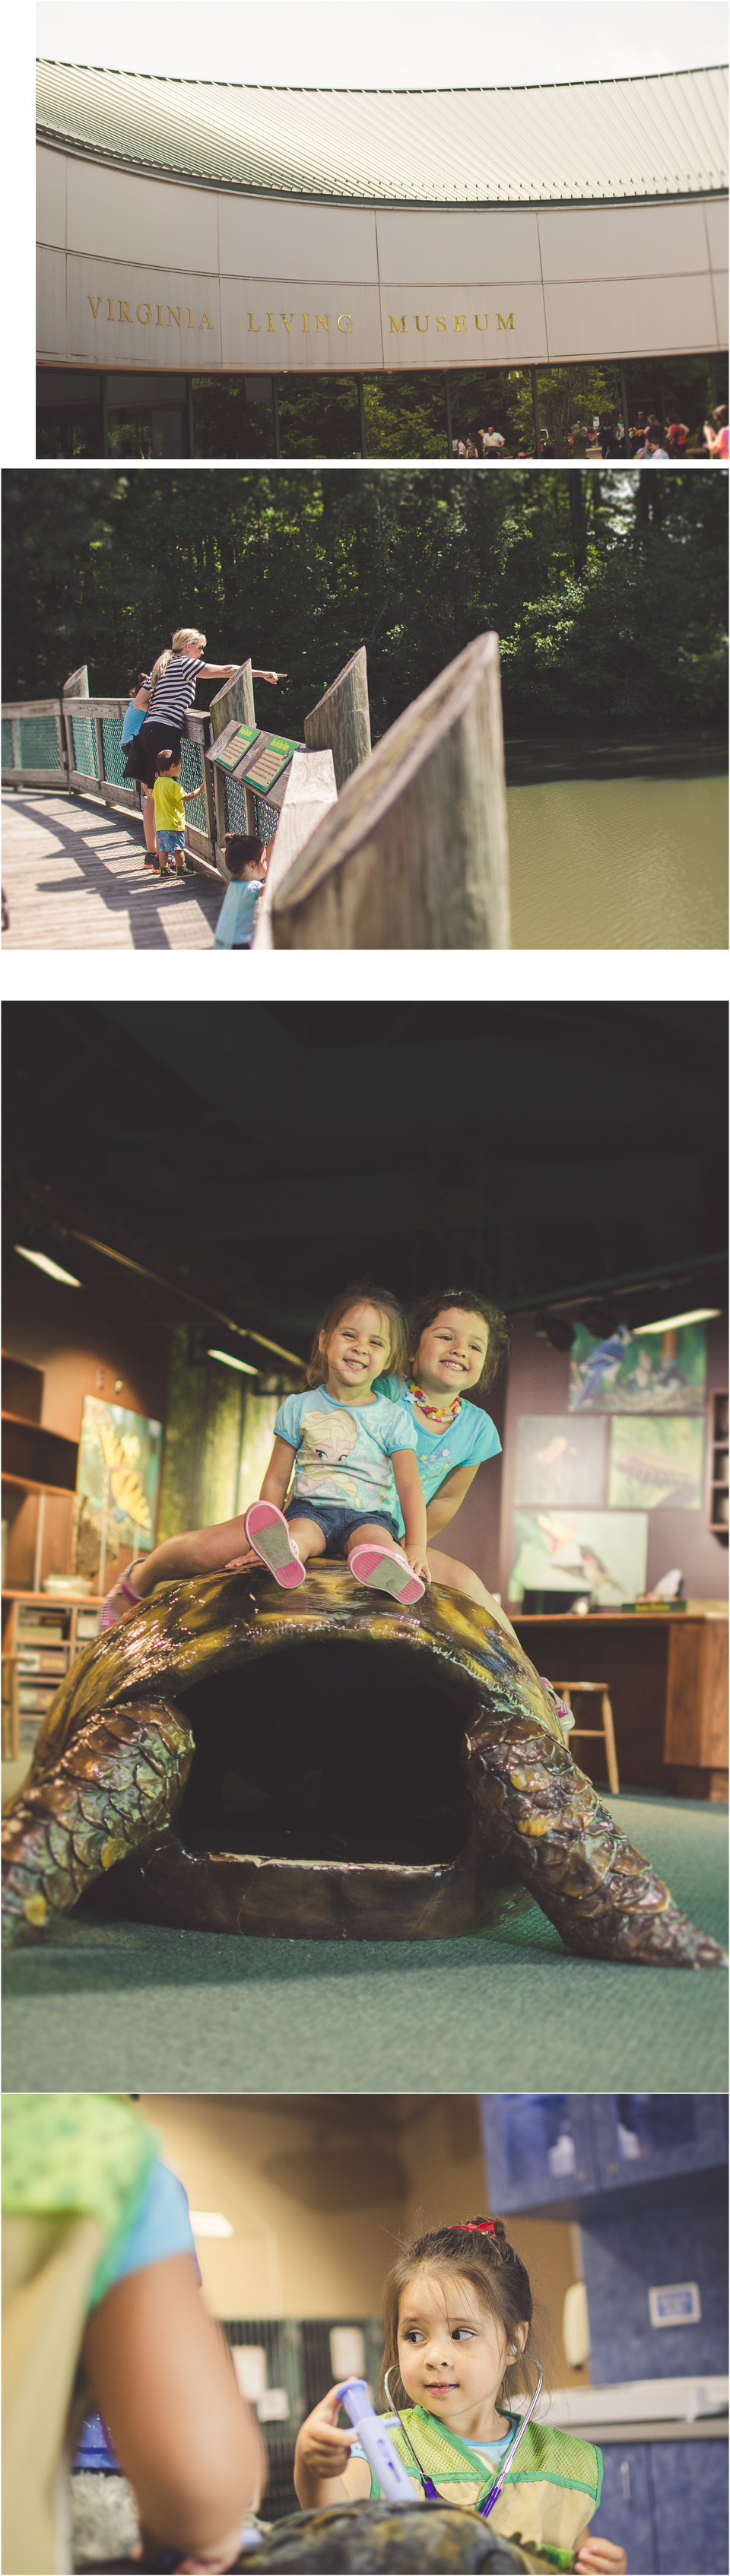 virginia living museum newport news Family Vacation 2015 nikon d7000 nikkor 35mm 1.8  fun family chi